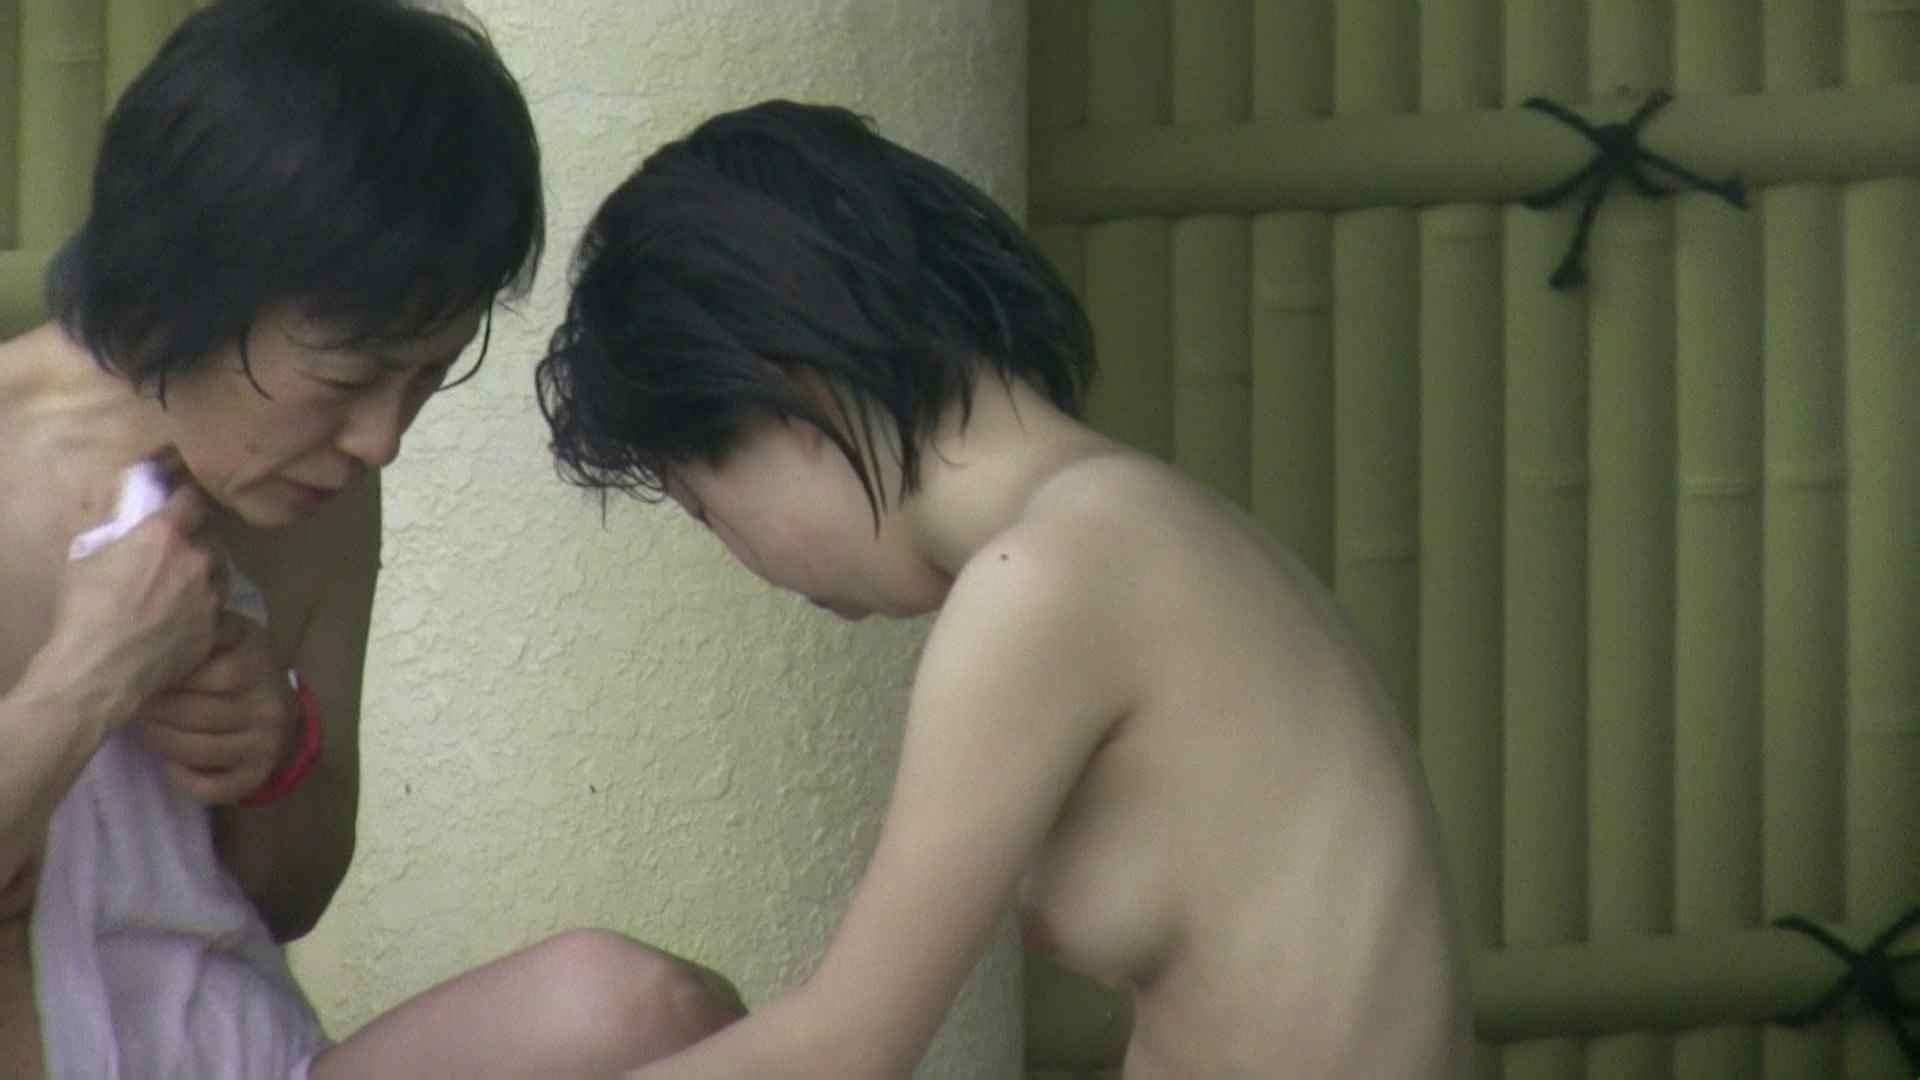 Aquaな露天風呂Vol.06【VIP】 HなOL | 盗撮  86pic 16